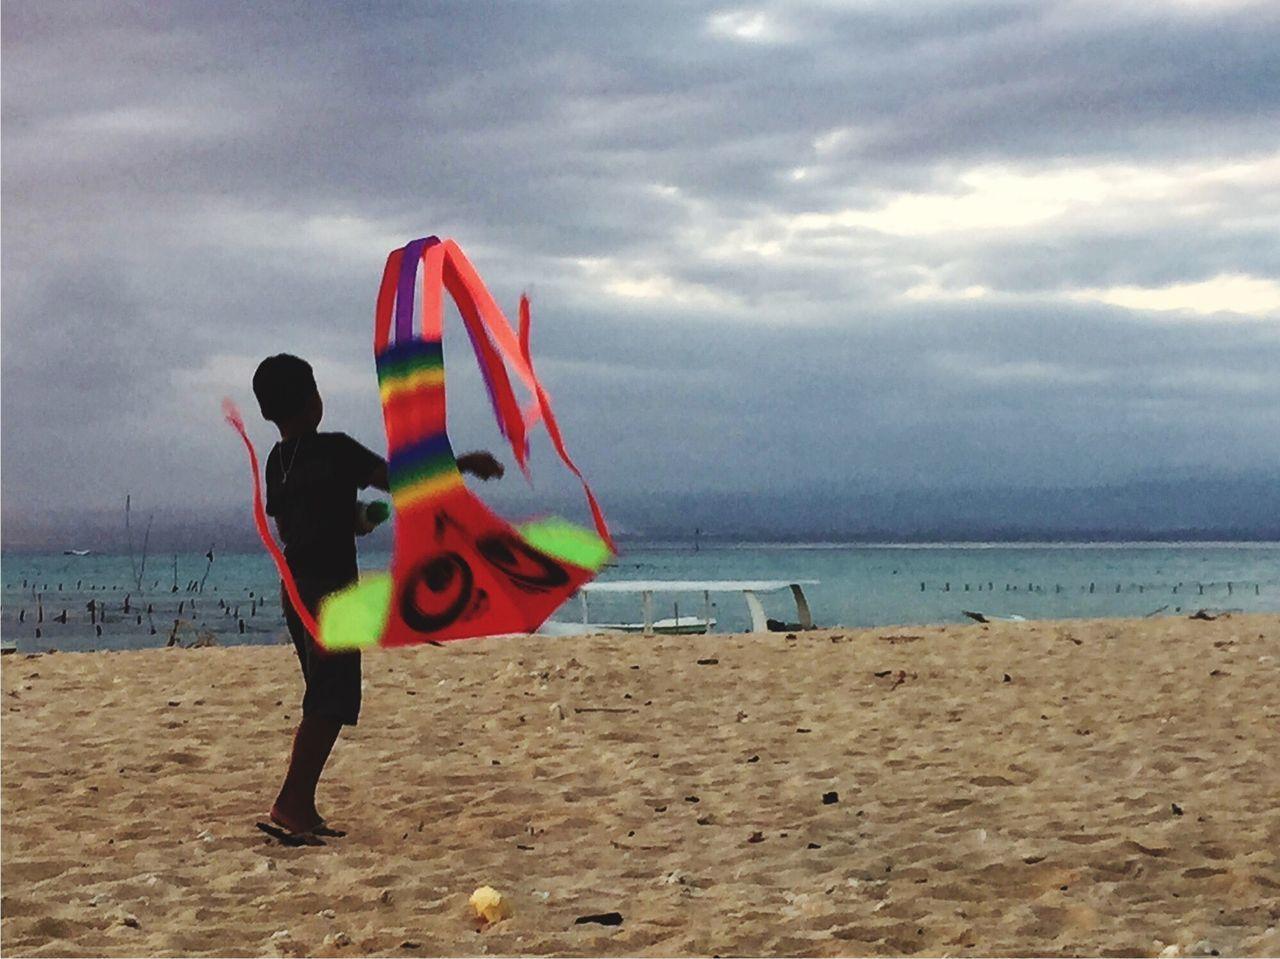 EyeEmNewHere INDONESIA Nusa Lembongan Beach Beach Fun Boy Motion Motion Blur Kite Flying Kite Rainbow